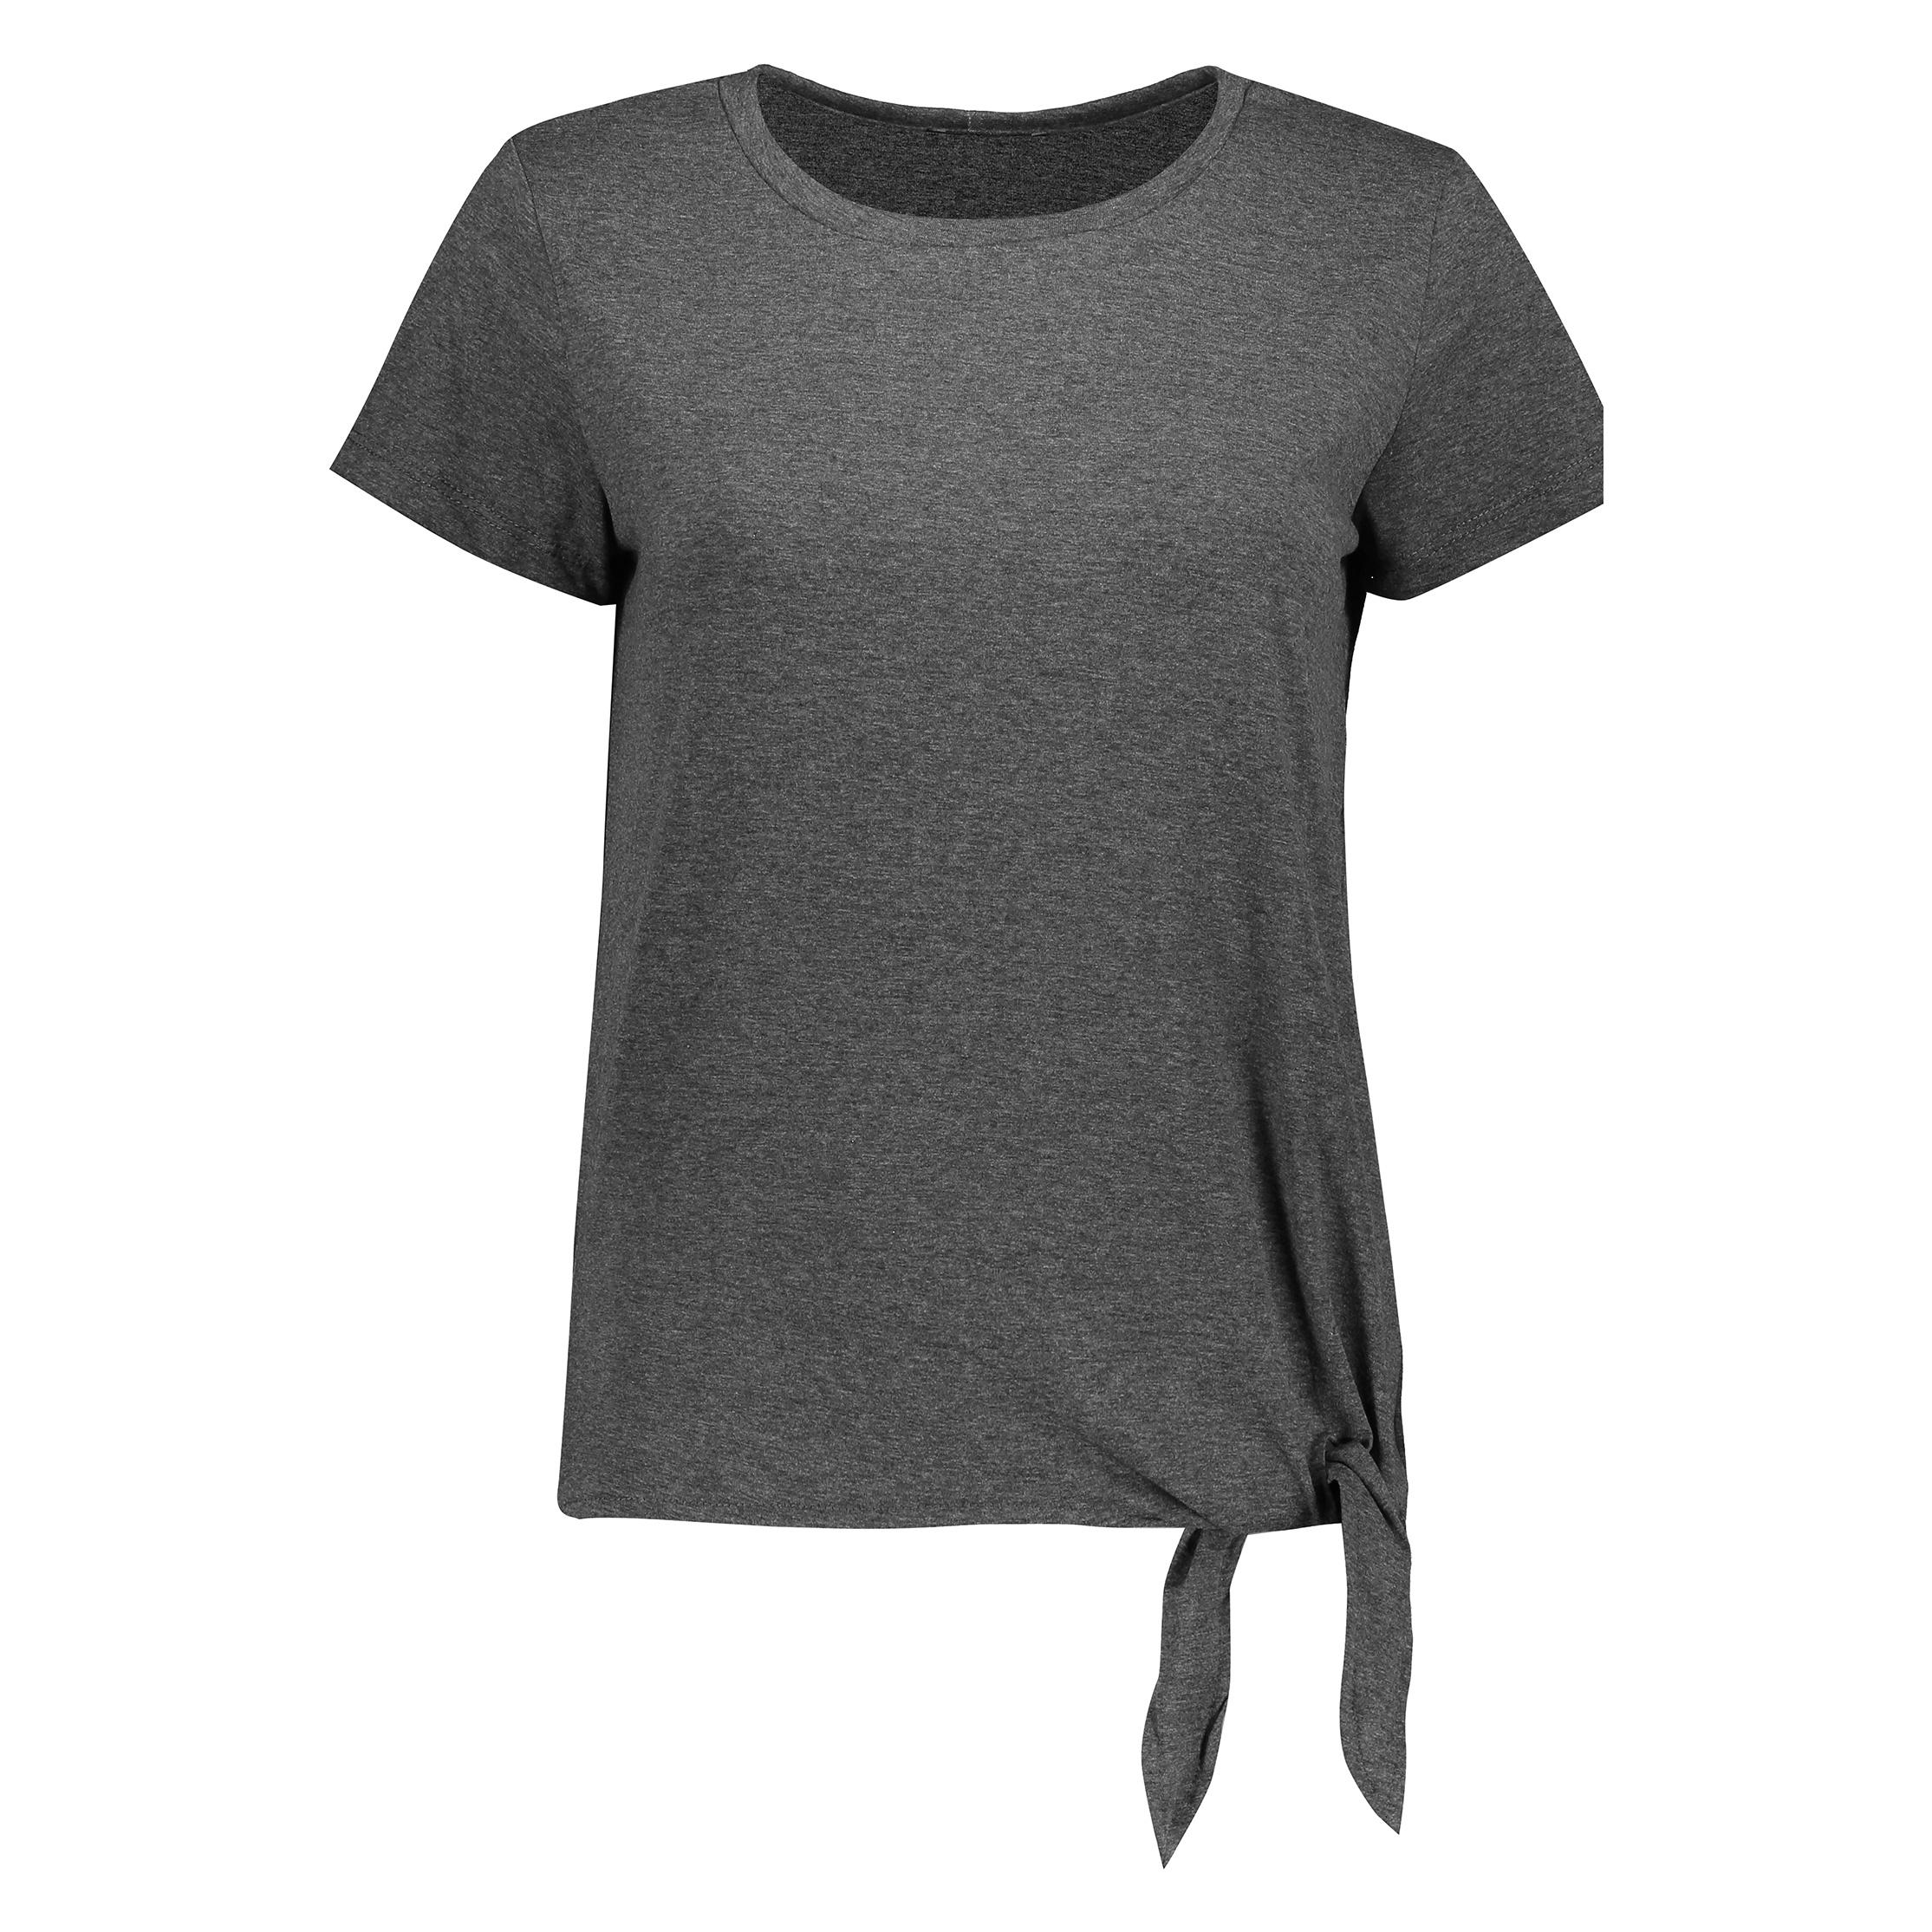 تی شرت زنانه آر ان اس مدل 1102066-94